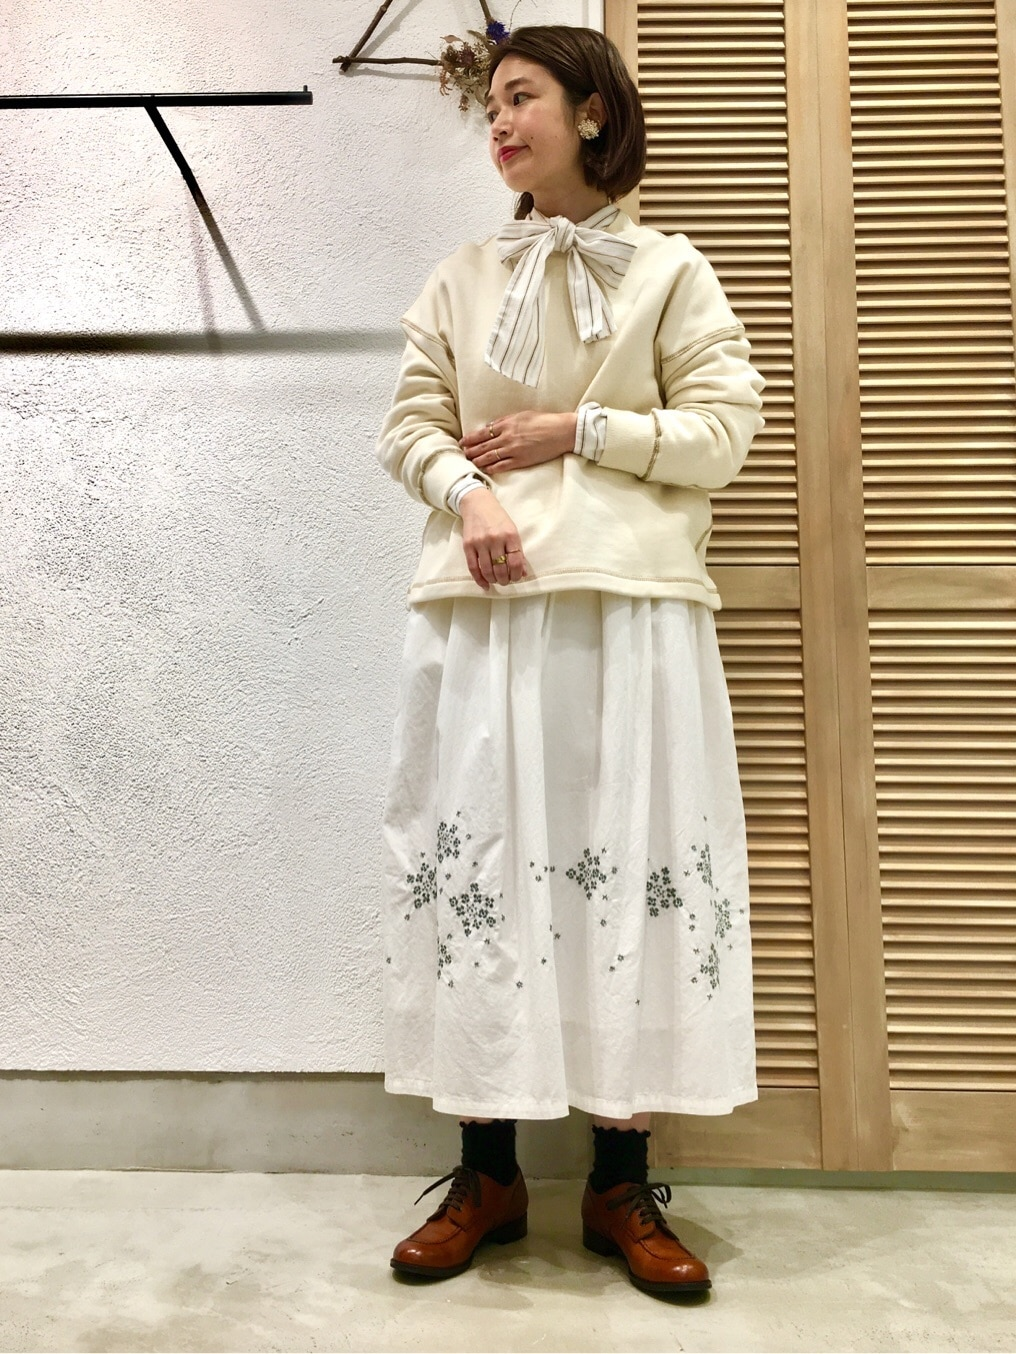 chambre de charme 横浜ジョイナス 身長:160cm 2021.01.28